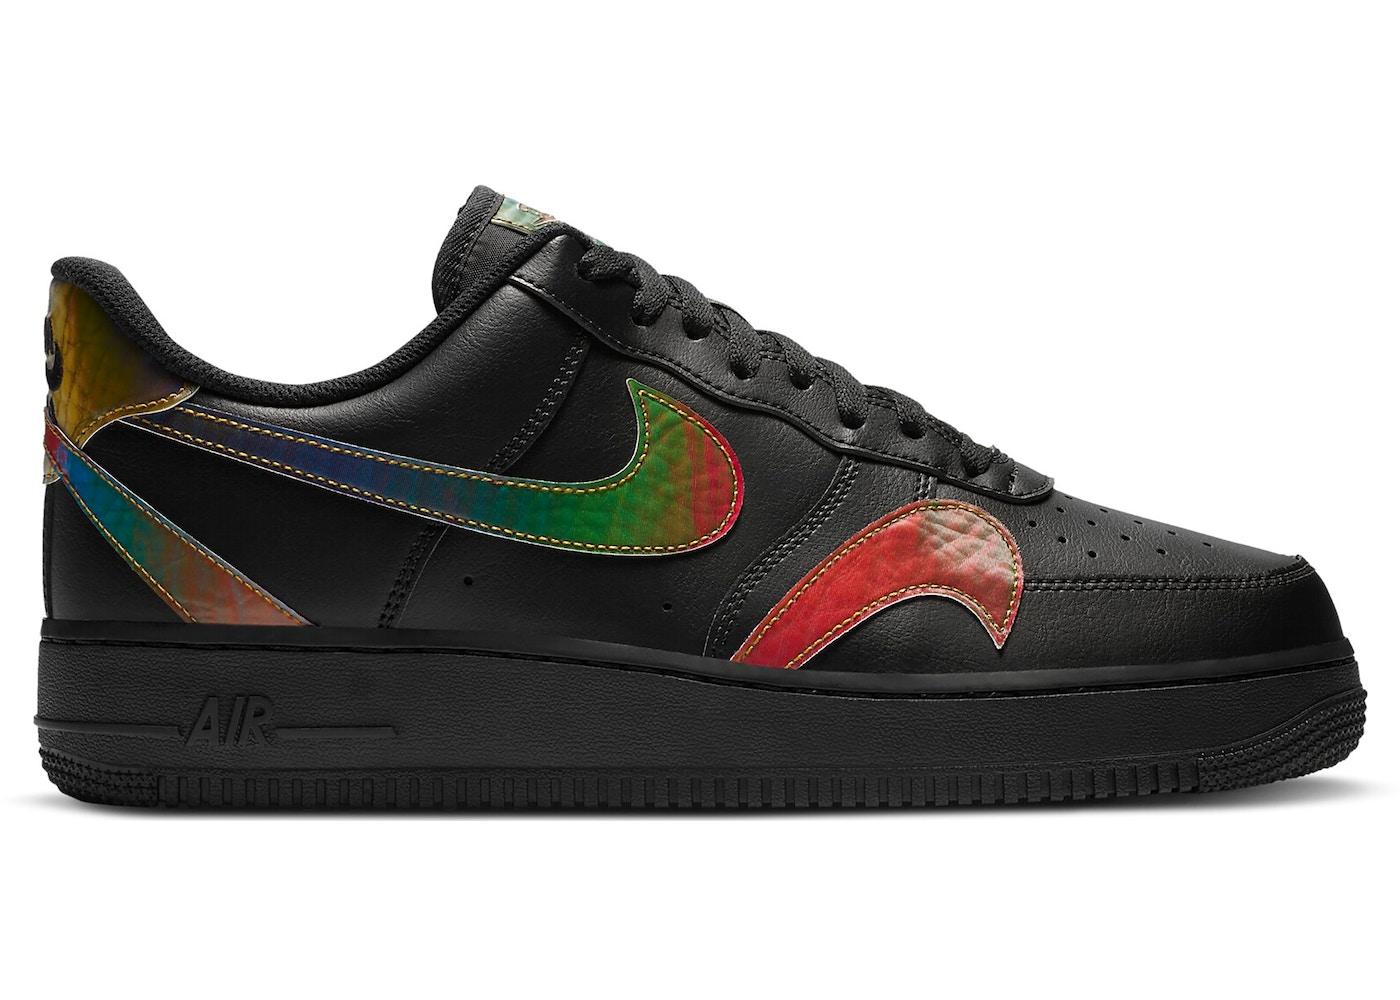 Nike Air Force 1 Low Misplaced Swooshes Black Multi